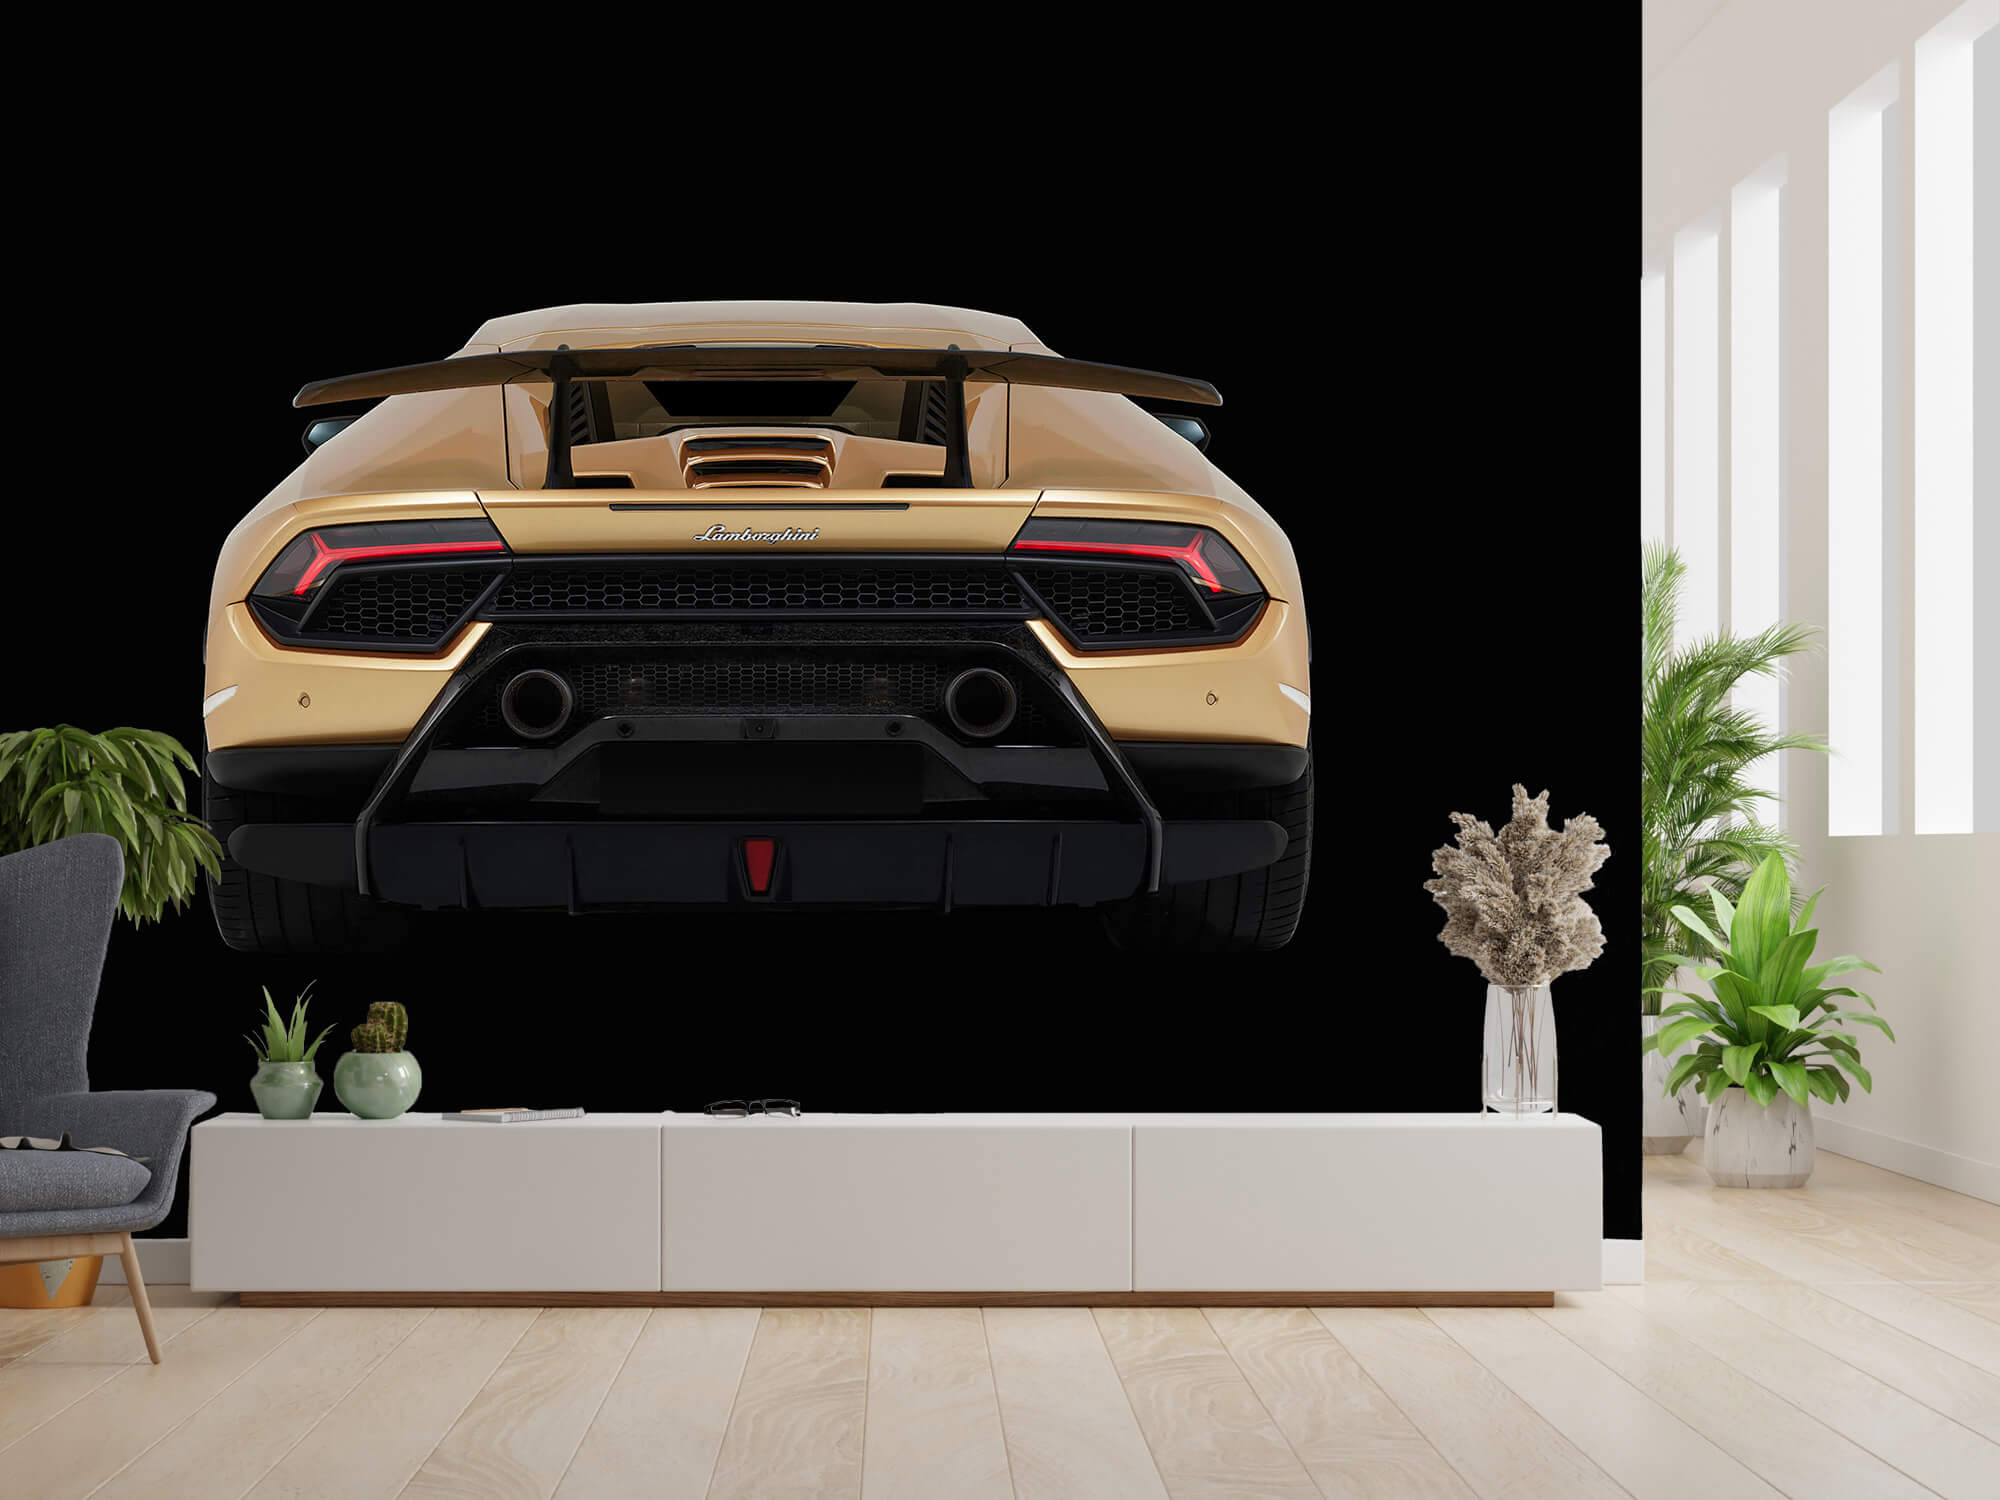 Wallpaper Lamborghini Huracán - Arrière, noir 2